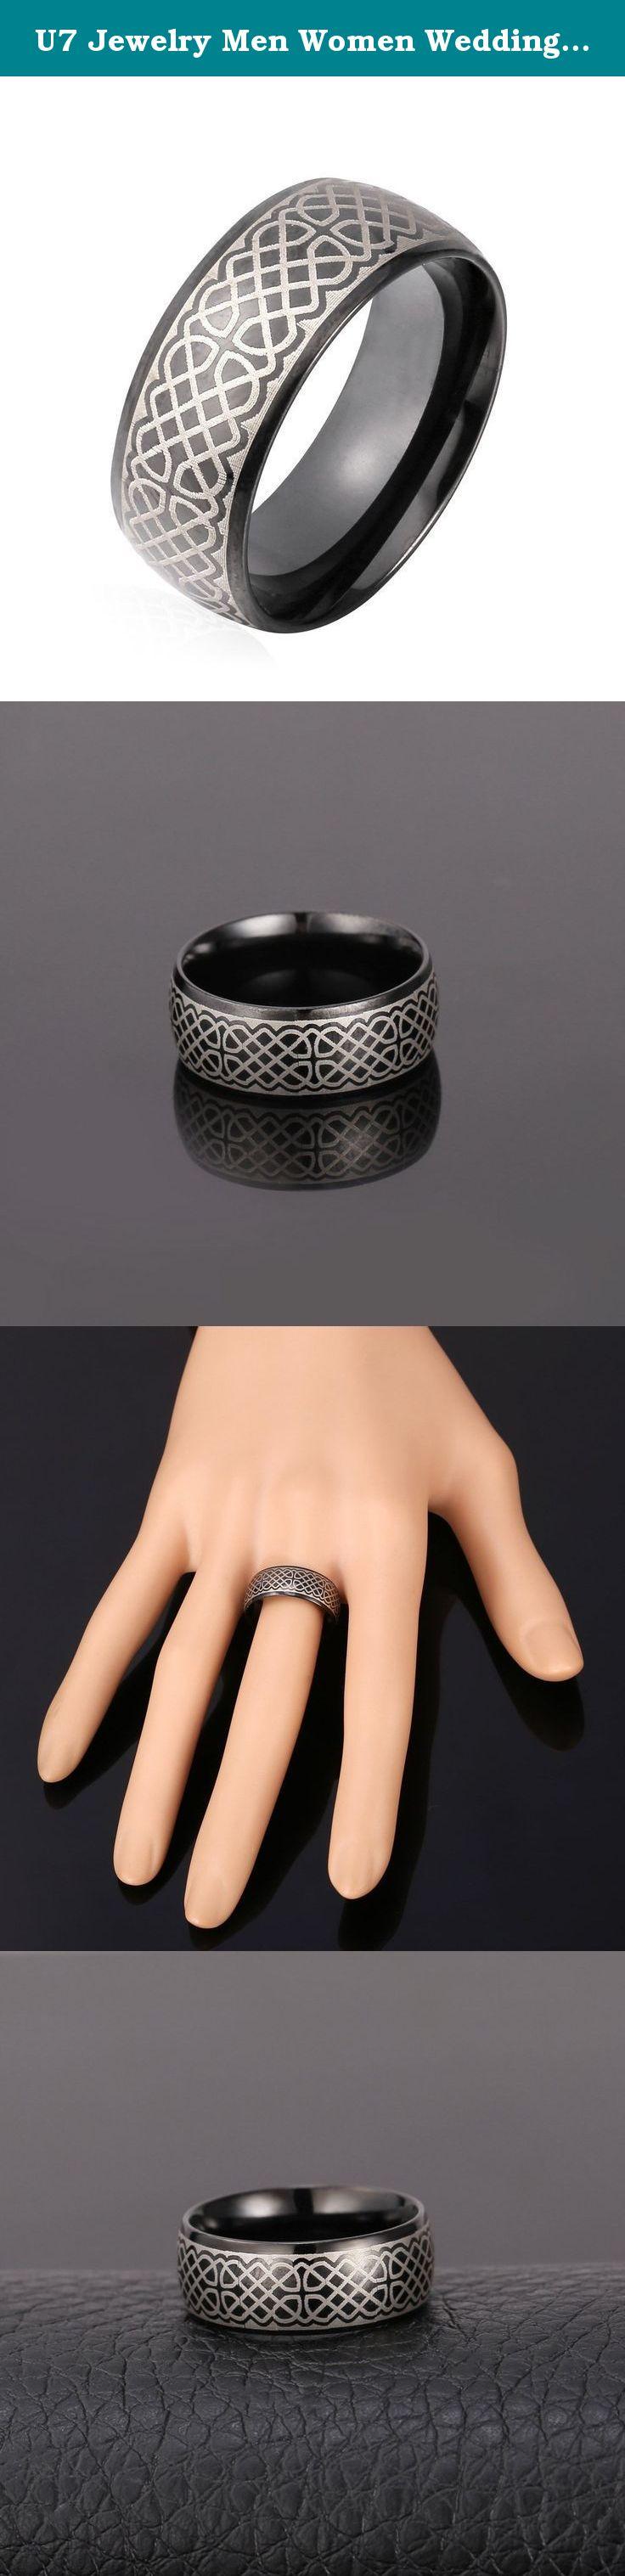 U7 Jewelry Men Women Wedding Black Gun Plated Ring 8MM Stainless